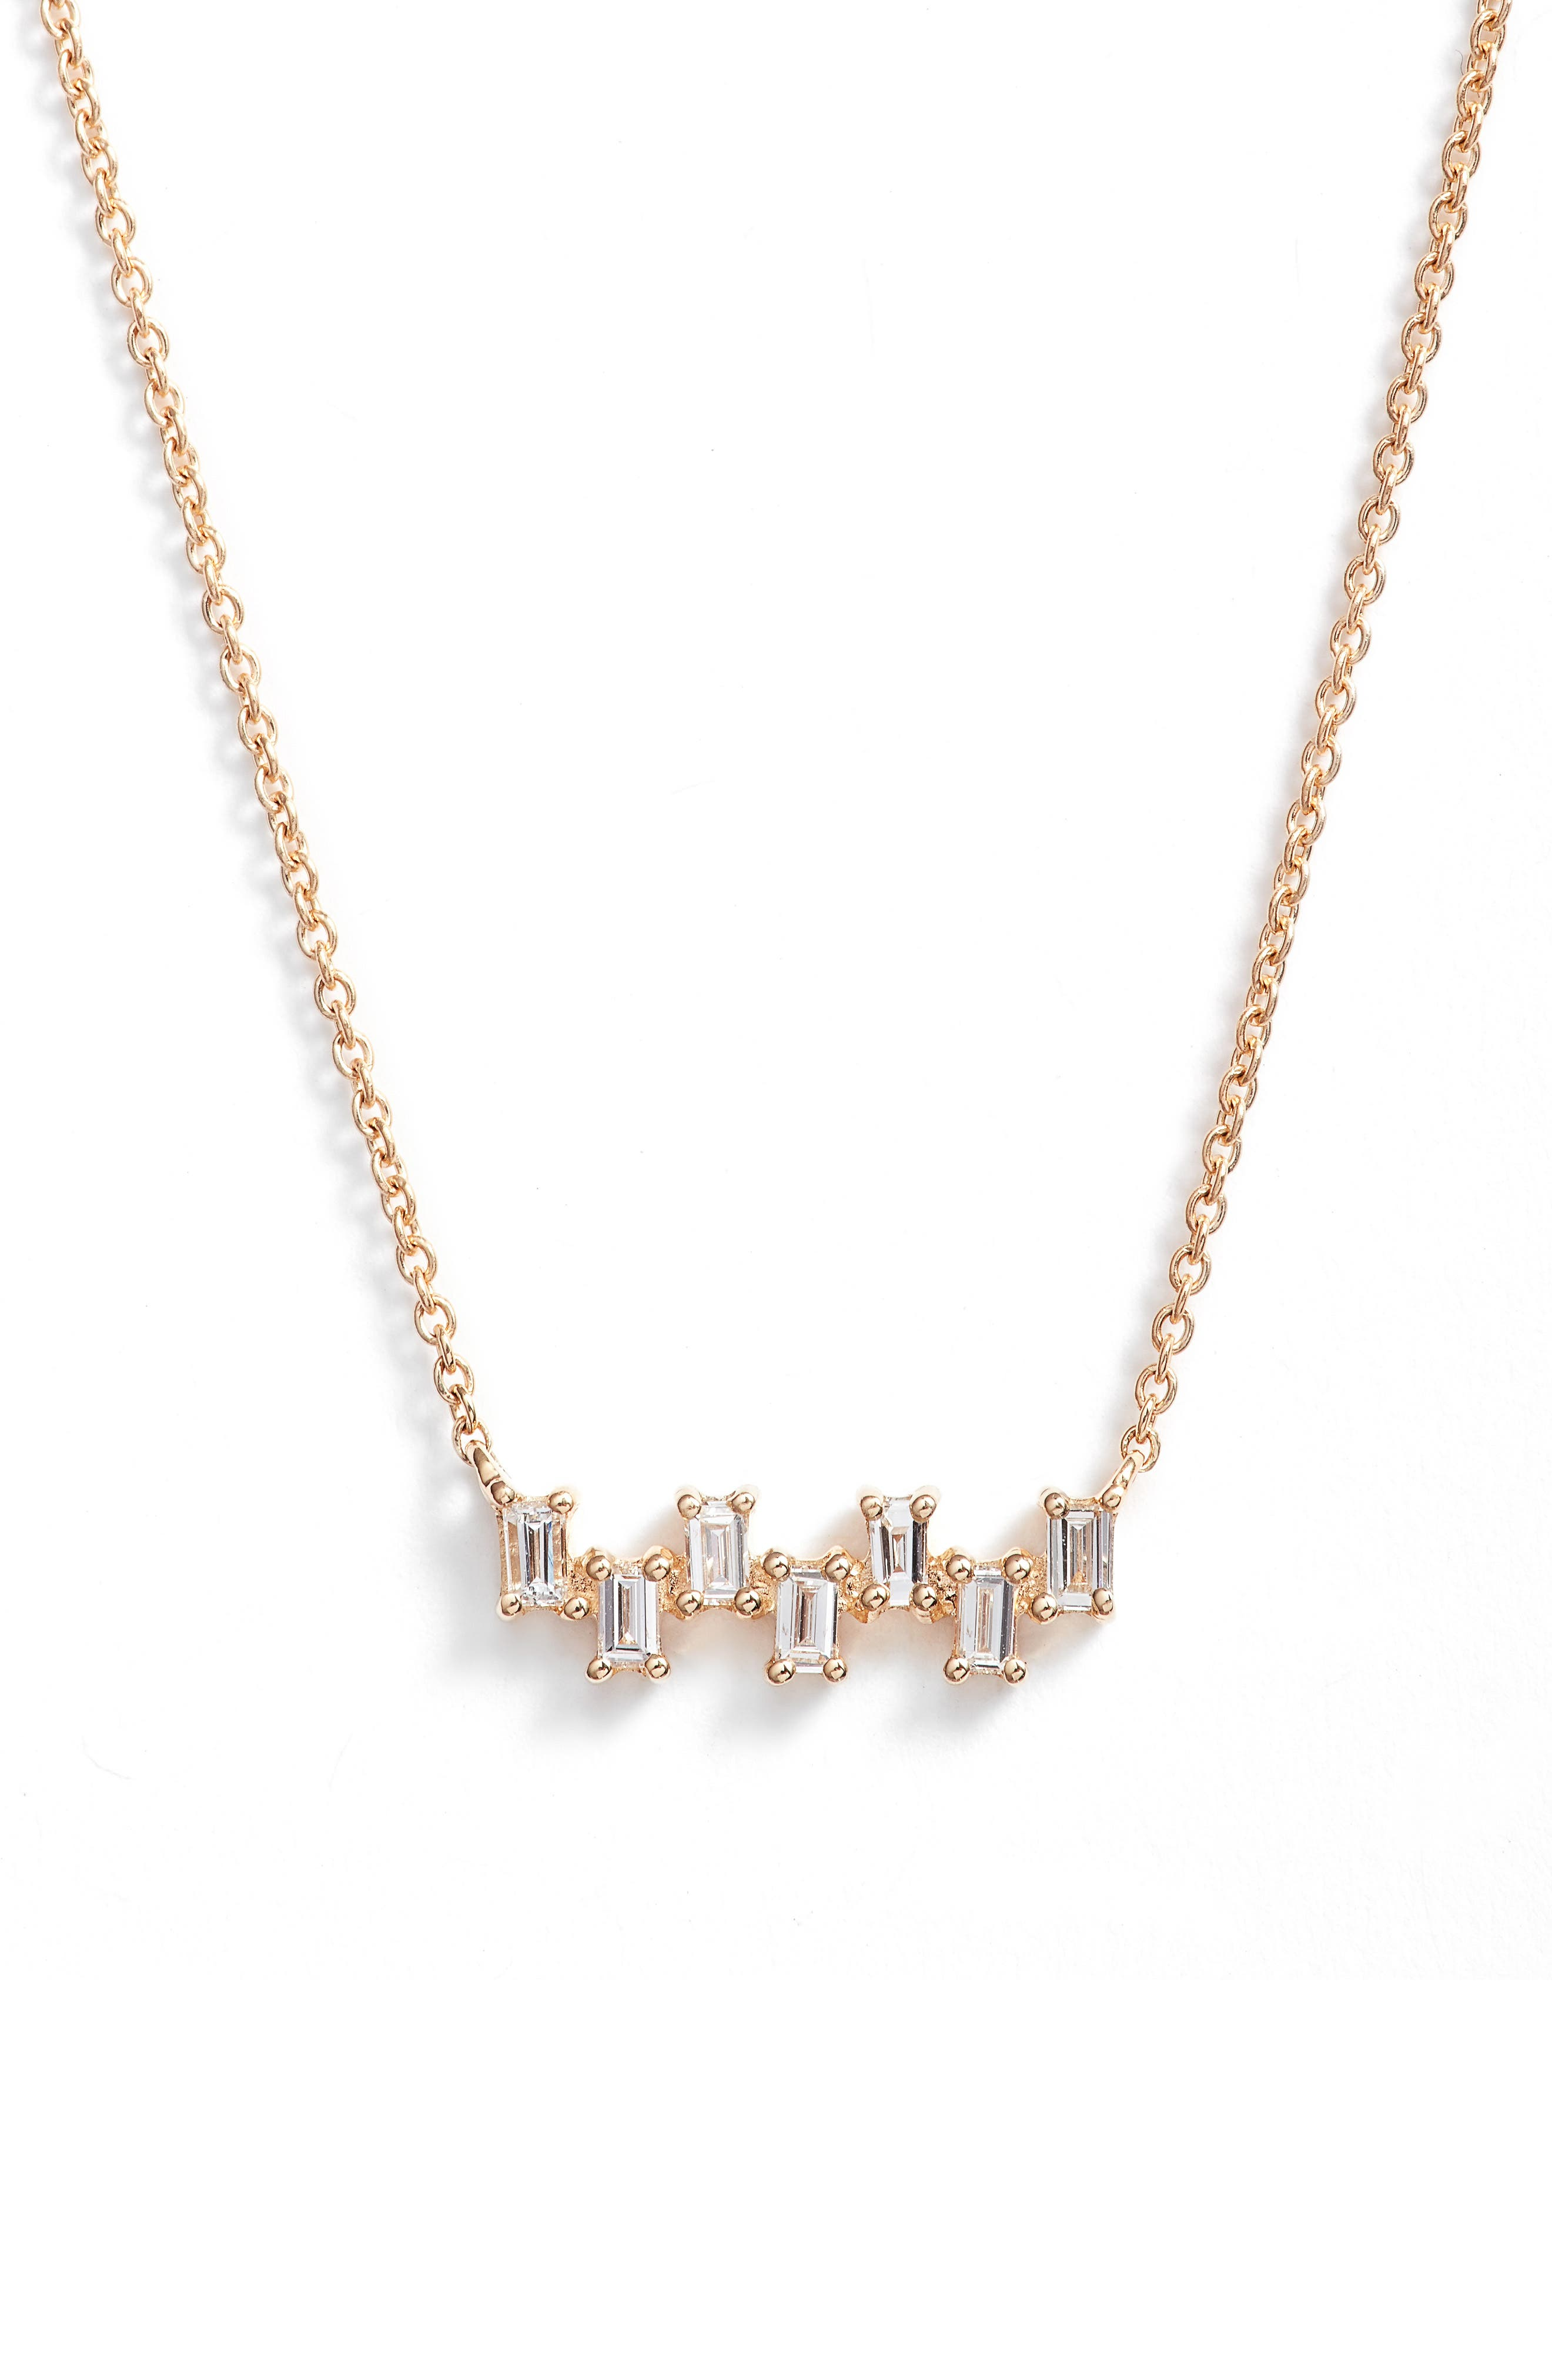 Sadie Diamond Bar Pendant Necklace,                             Main thumbnail 1, color,                             YELLOW GOLD